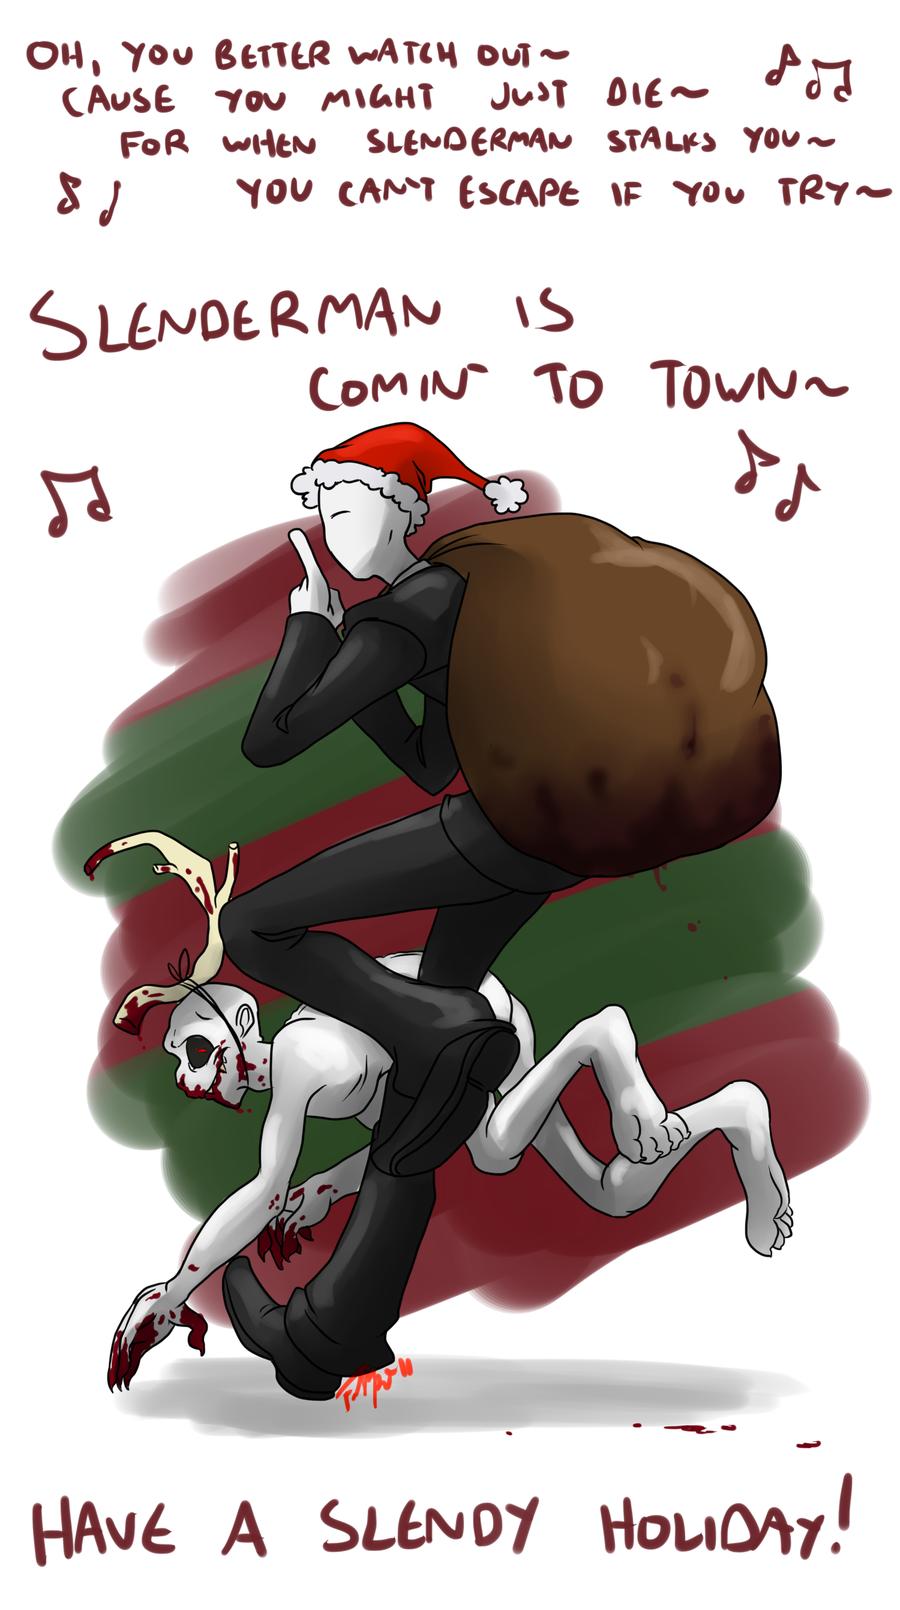 Drawn slenderman christmas Forte girl7  Is Comin'